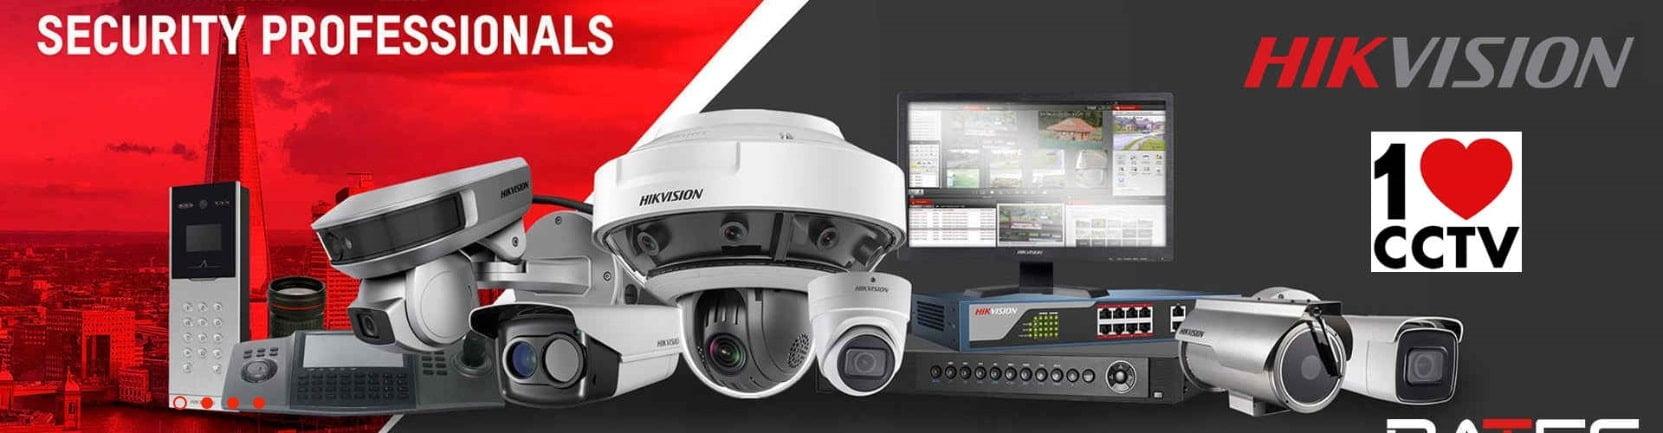 camere-de-supraveghere-exterior-HIKVISION-1CCTV